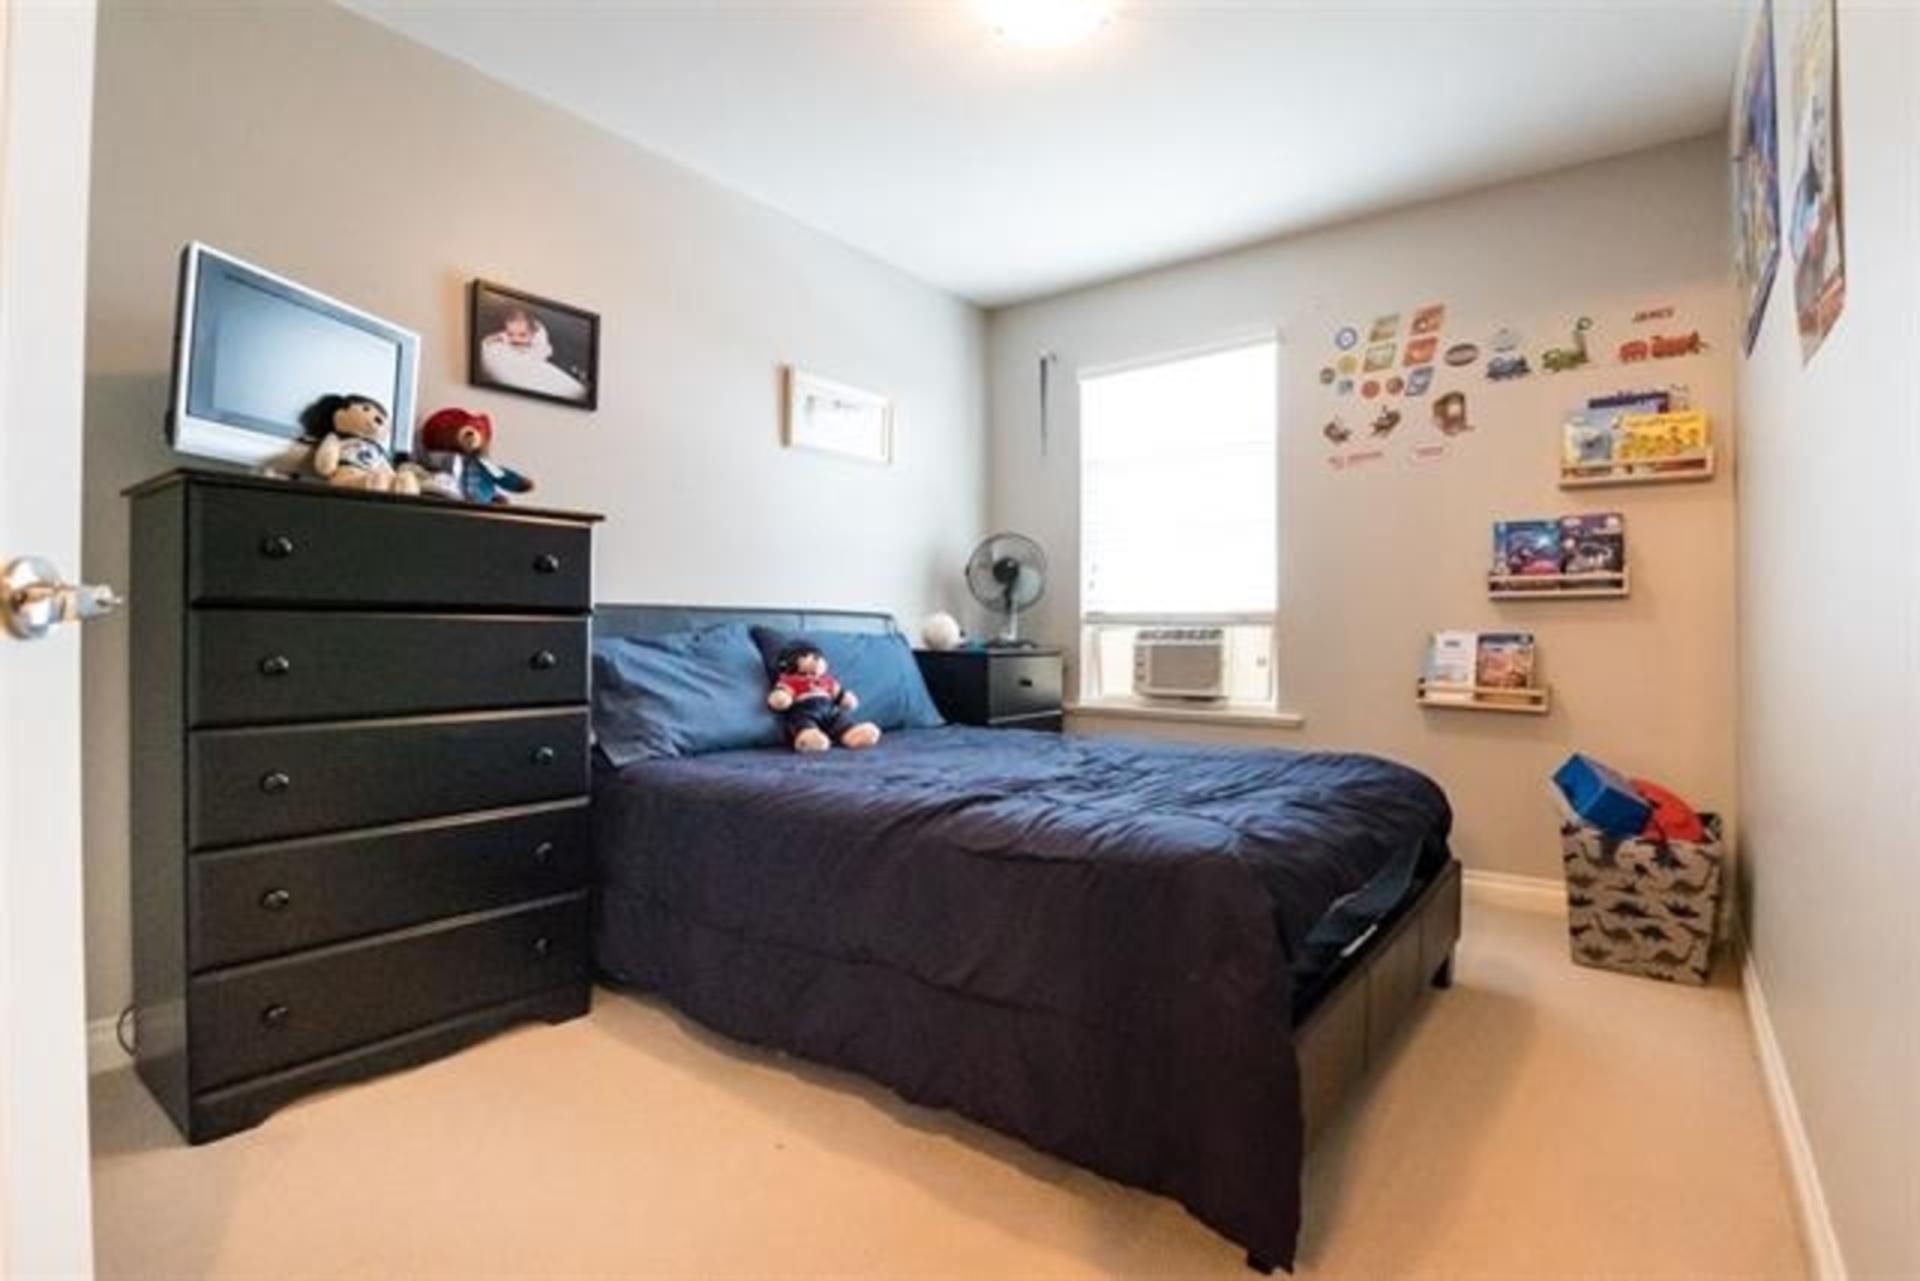 7039-180-street-cloverdale-bc-cloverdale-13 at 7039 180 Street, Cloverdale BC, Cloverdale